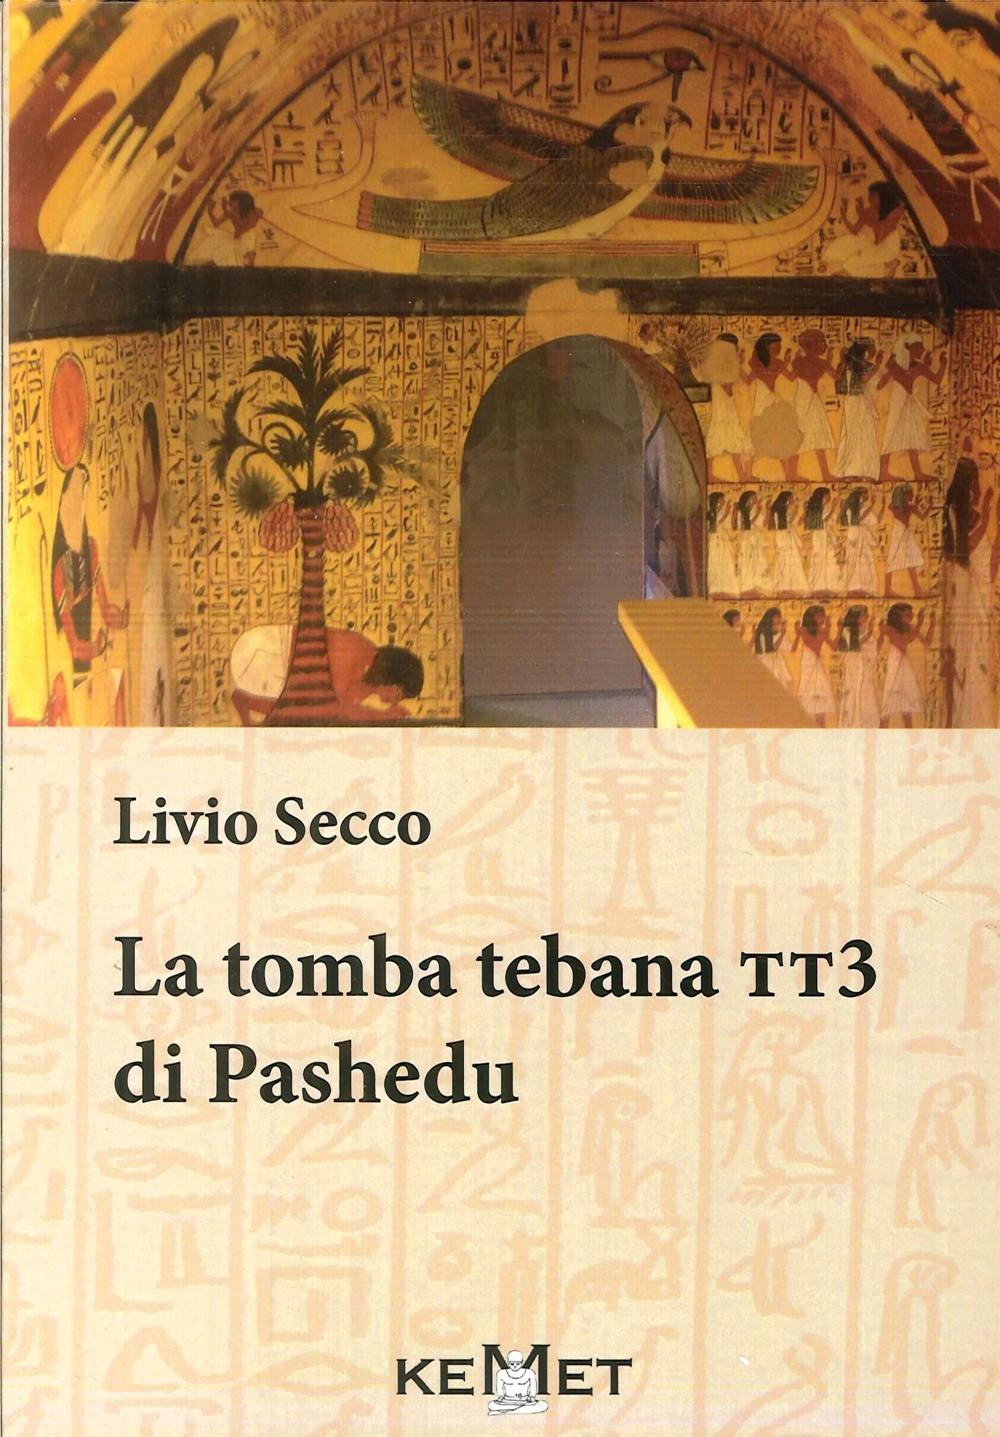 La Tomba Tebana Tte di Pashedu.